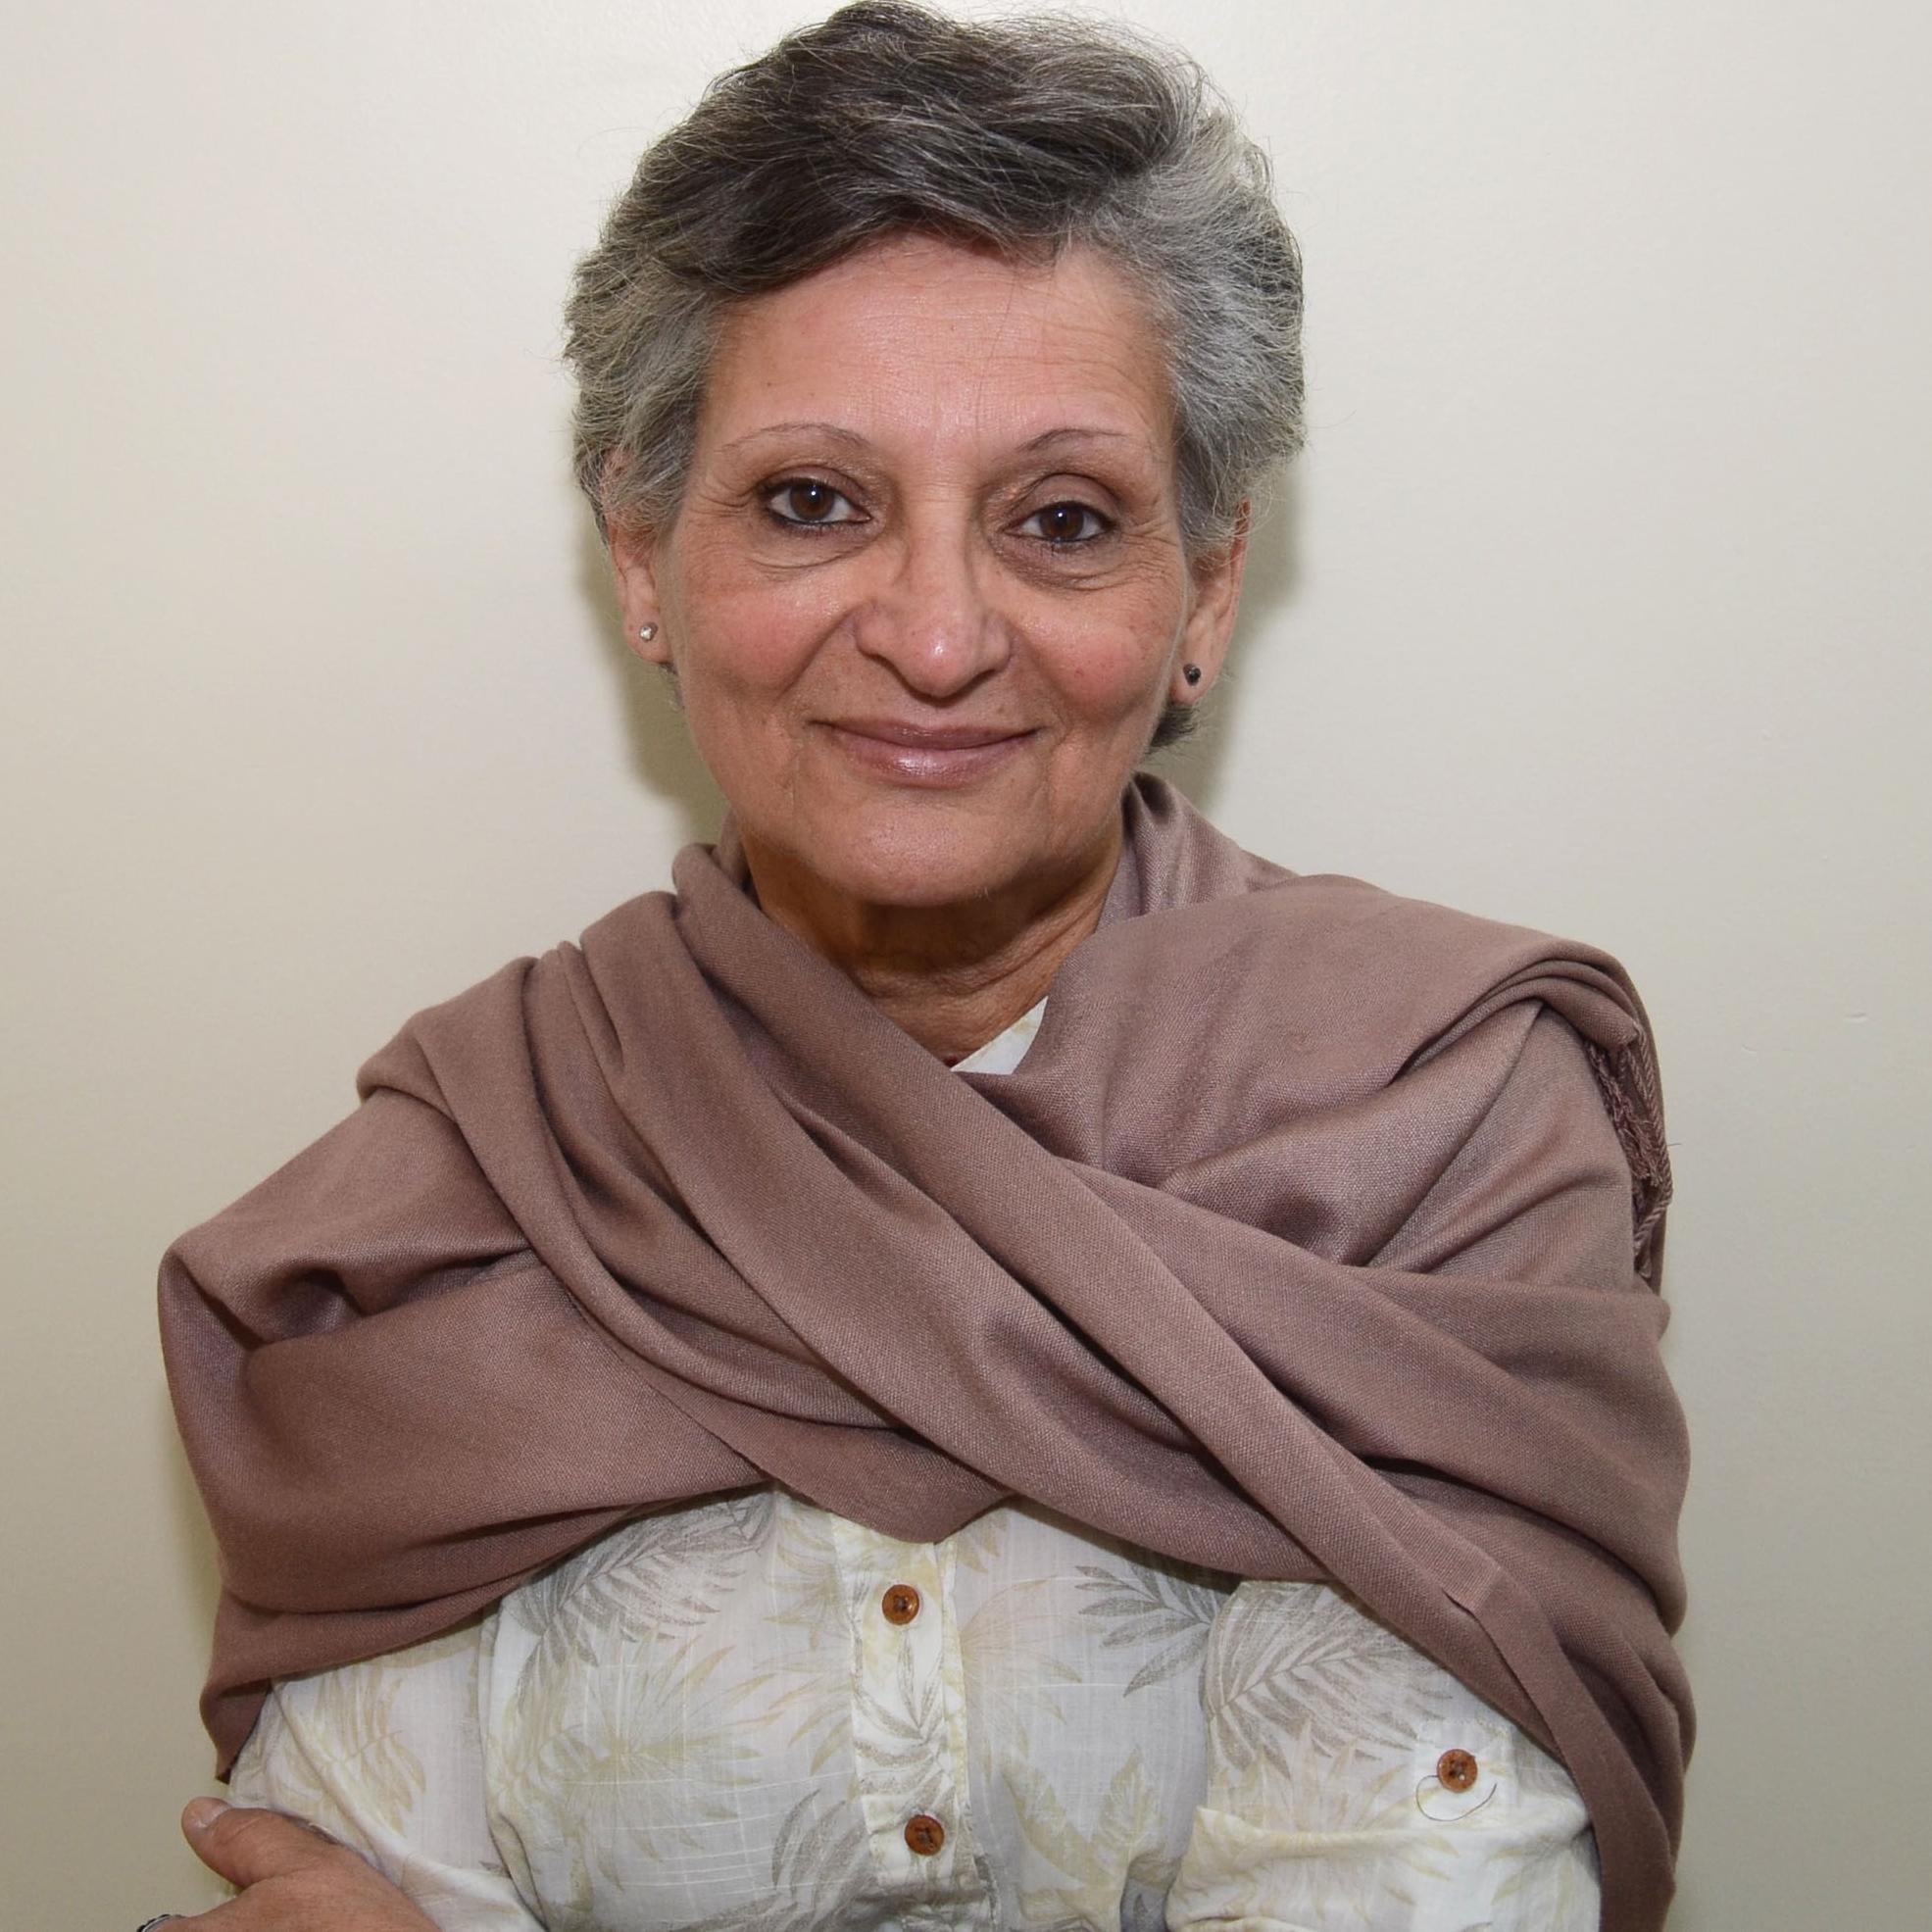 Profª. Drª. Maracy Domingues Alves